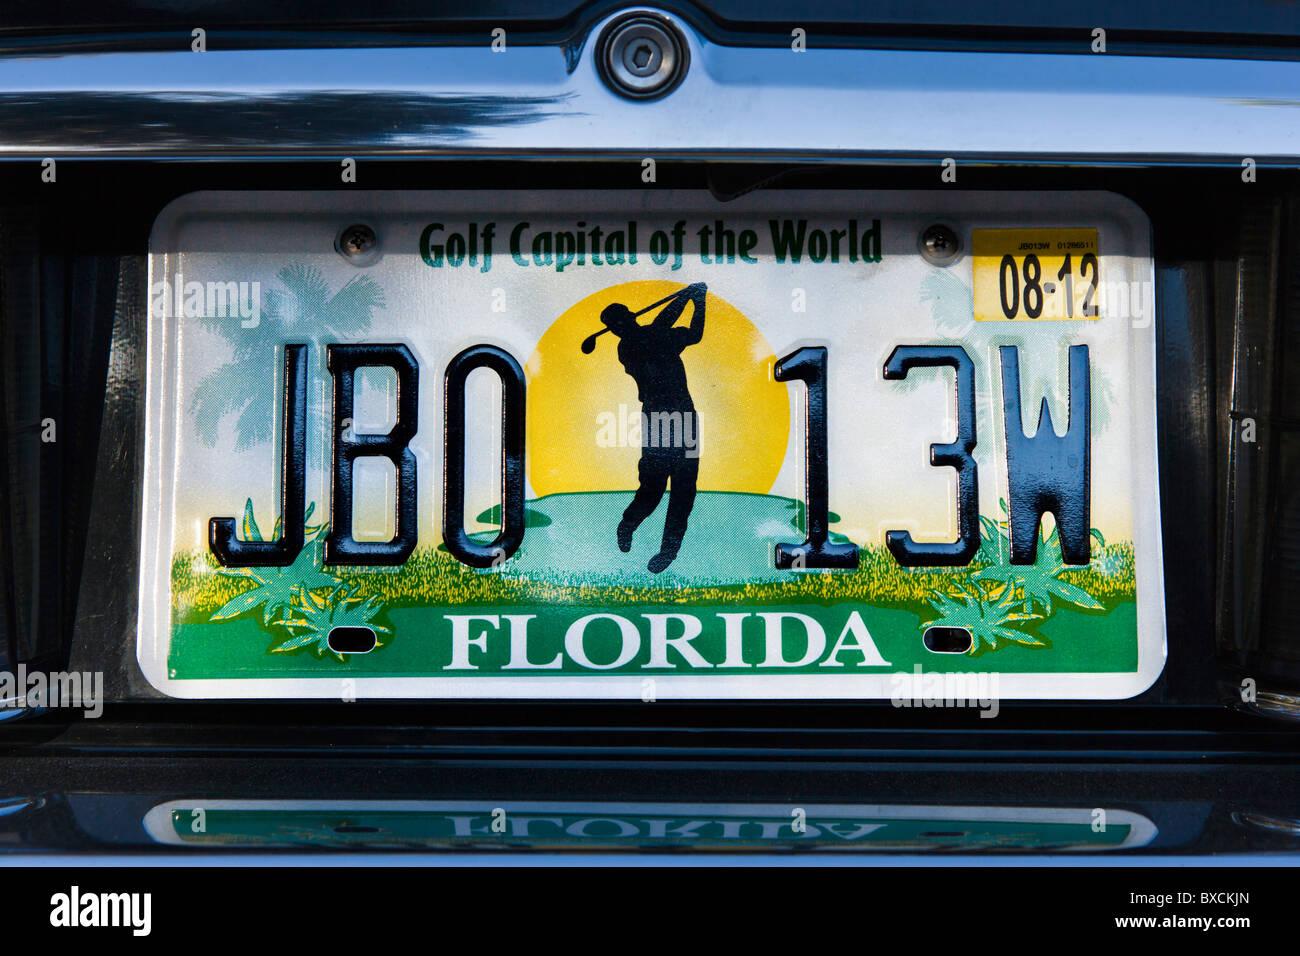 Florida Fahrzeug Nummernschild, USA Stockfoto, Bild: 33470269 - Alamy